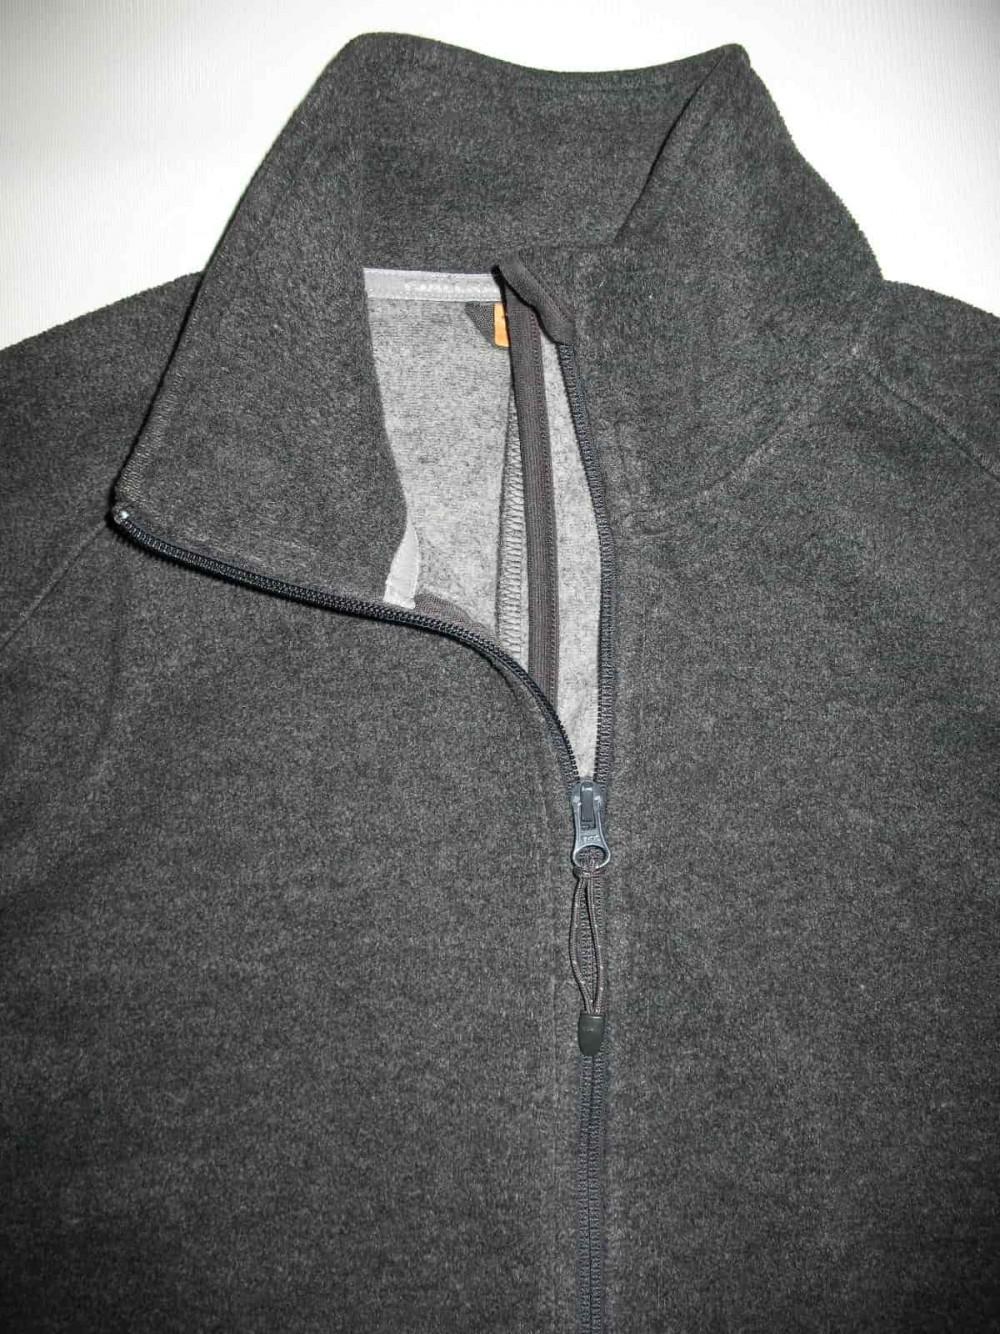 Кофта FJALLRAVEN tornetrask fleece jacket (размер L) - 5